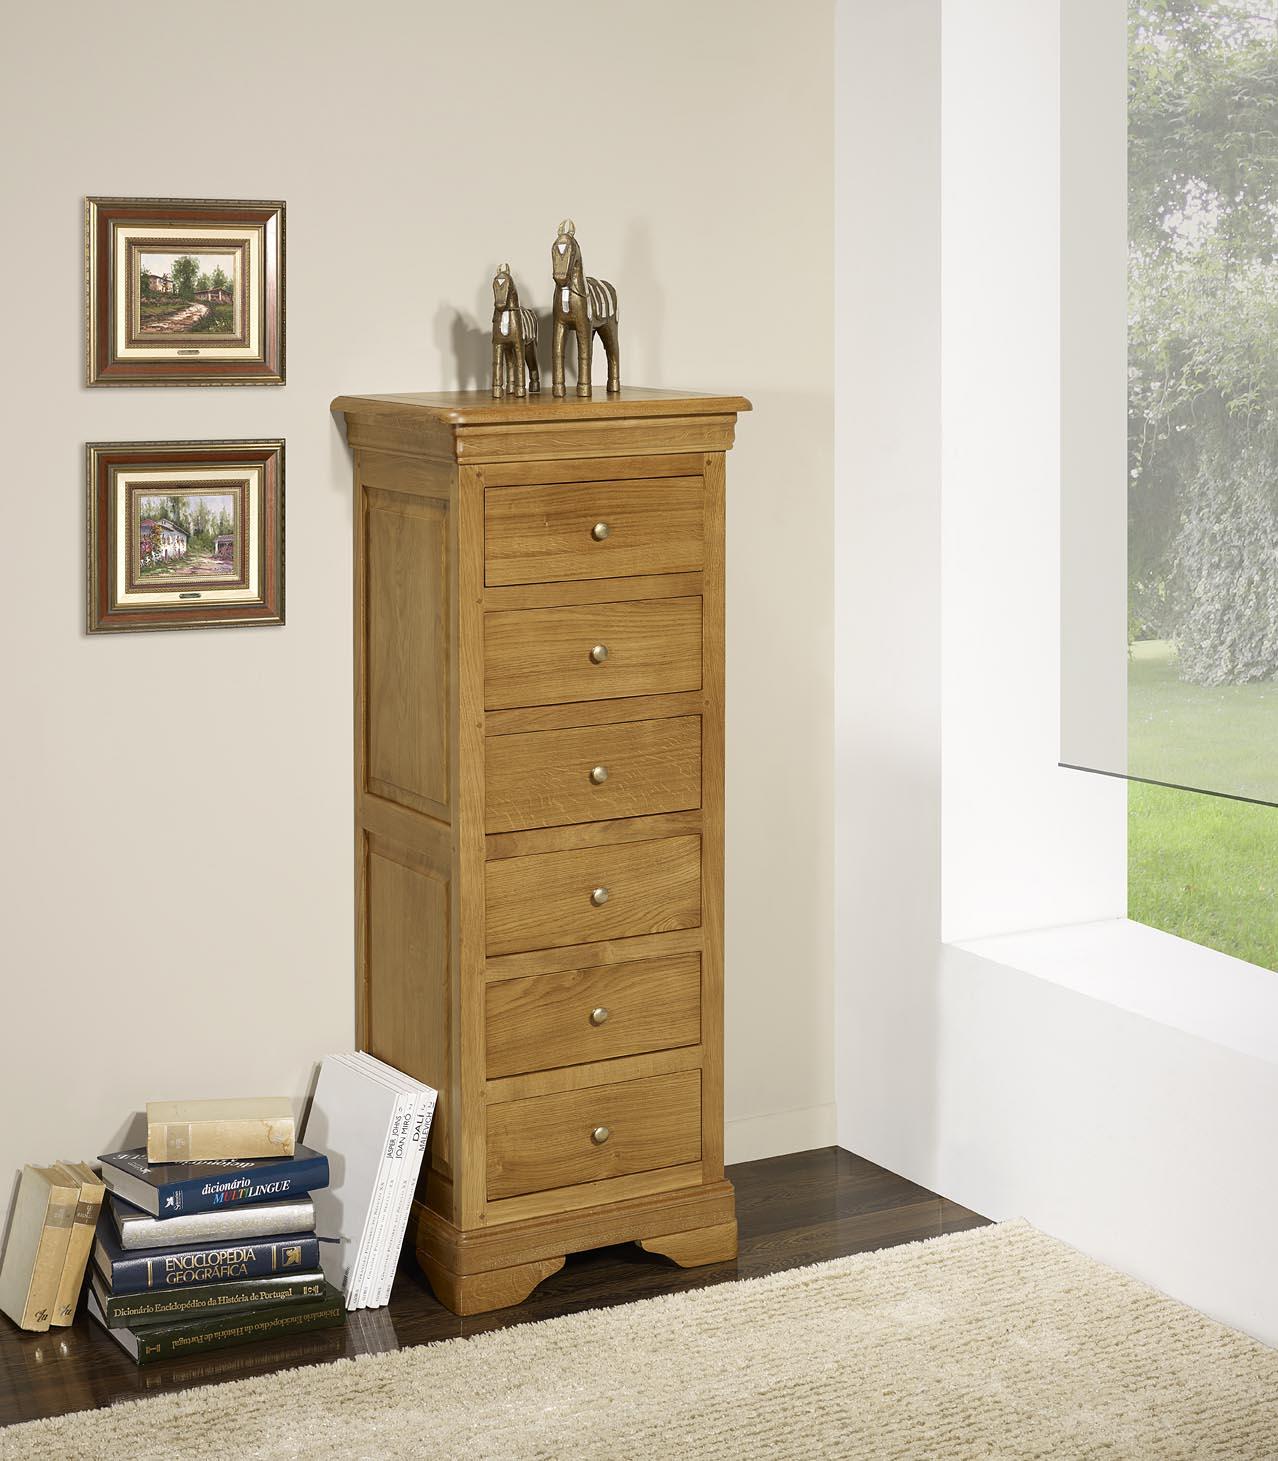 chiffonnier 6 tiroirs benjamin en ch ne massif de style louis philippe meuble en ch ne. Black Bedroom Furniture Sets. Home Design Ideas